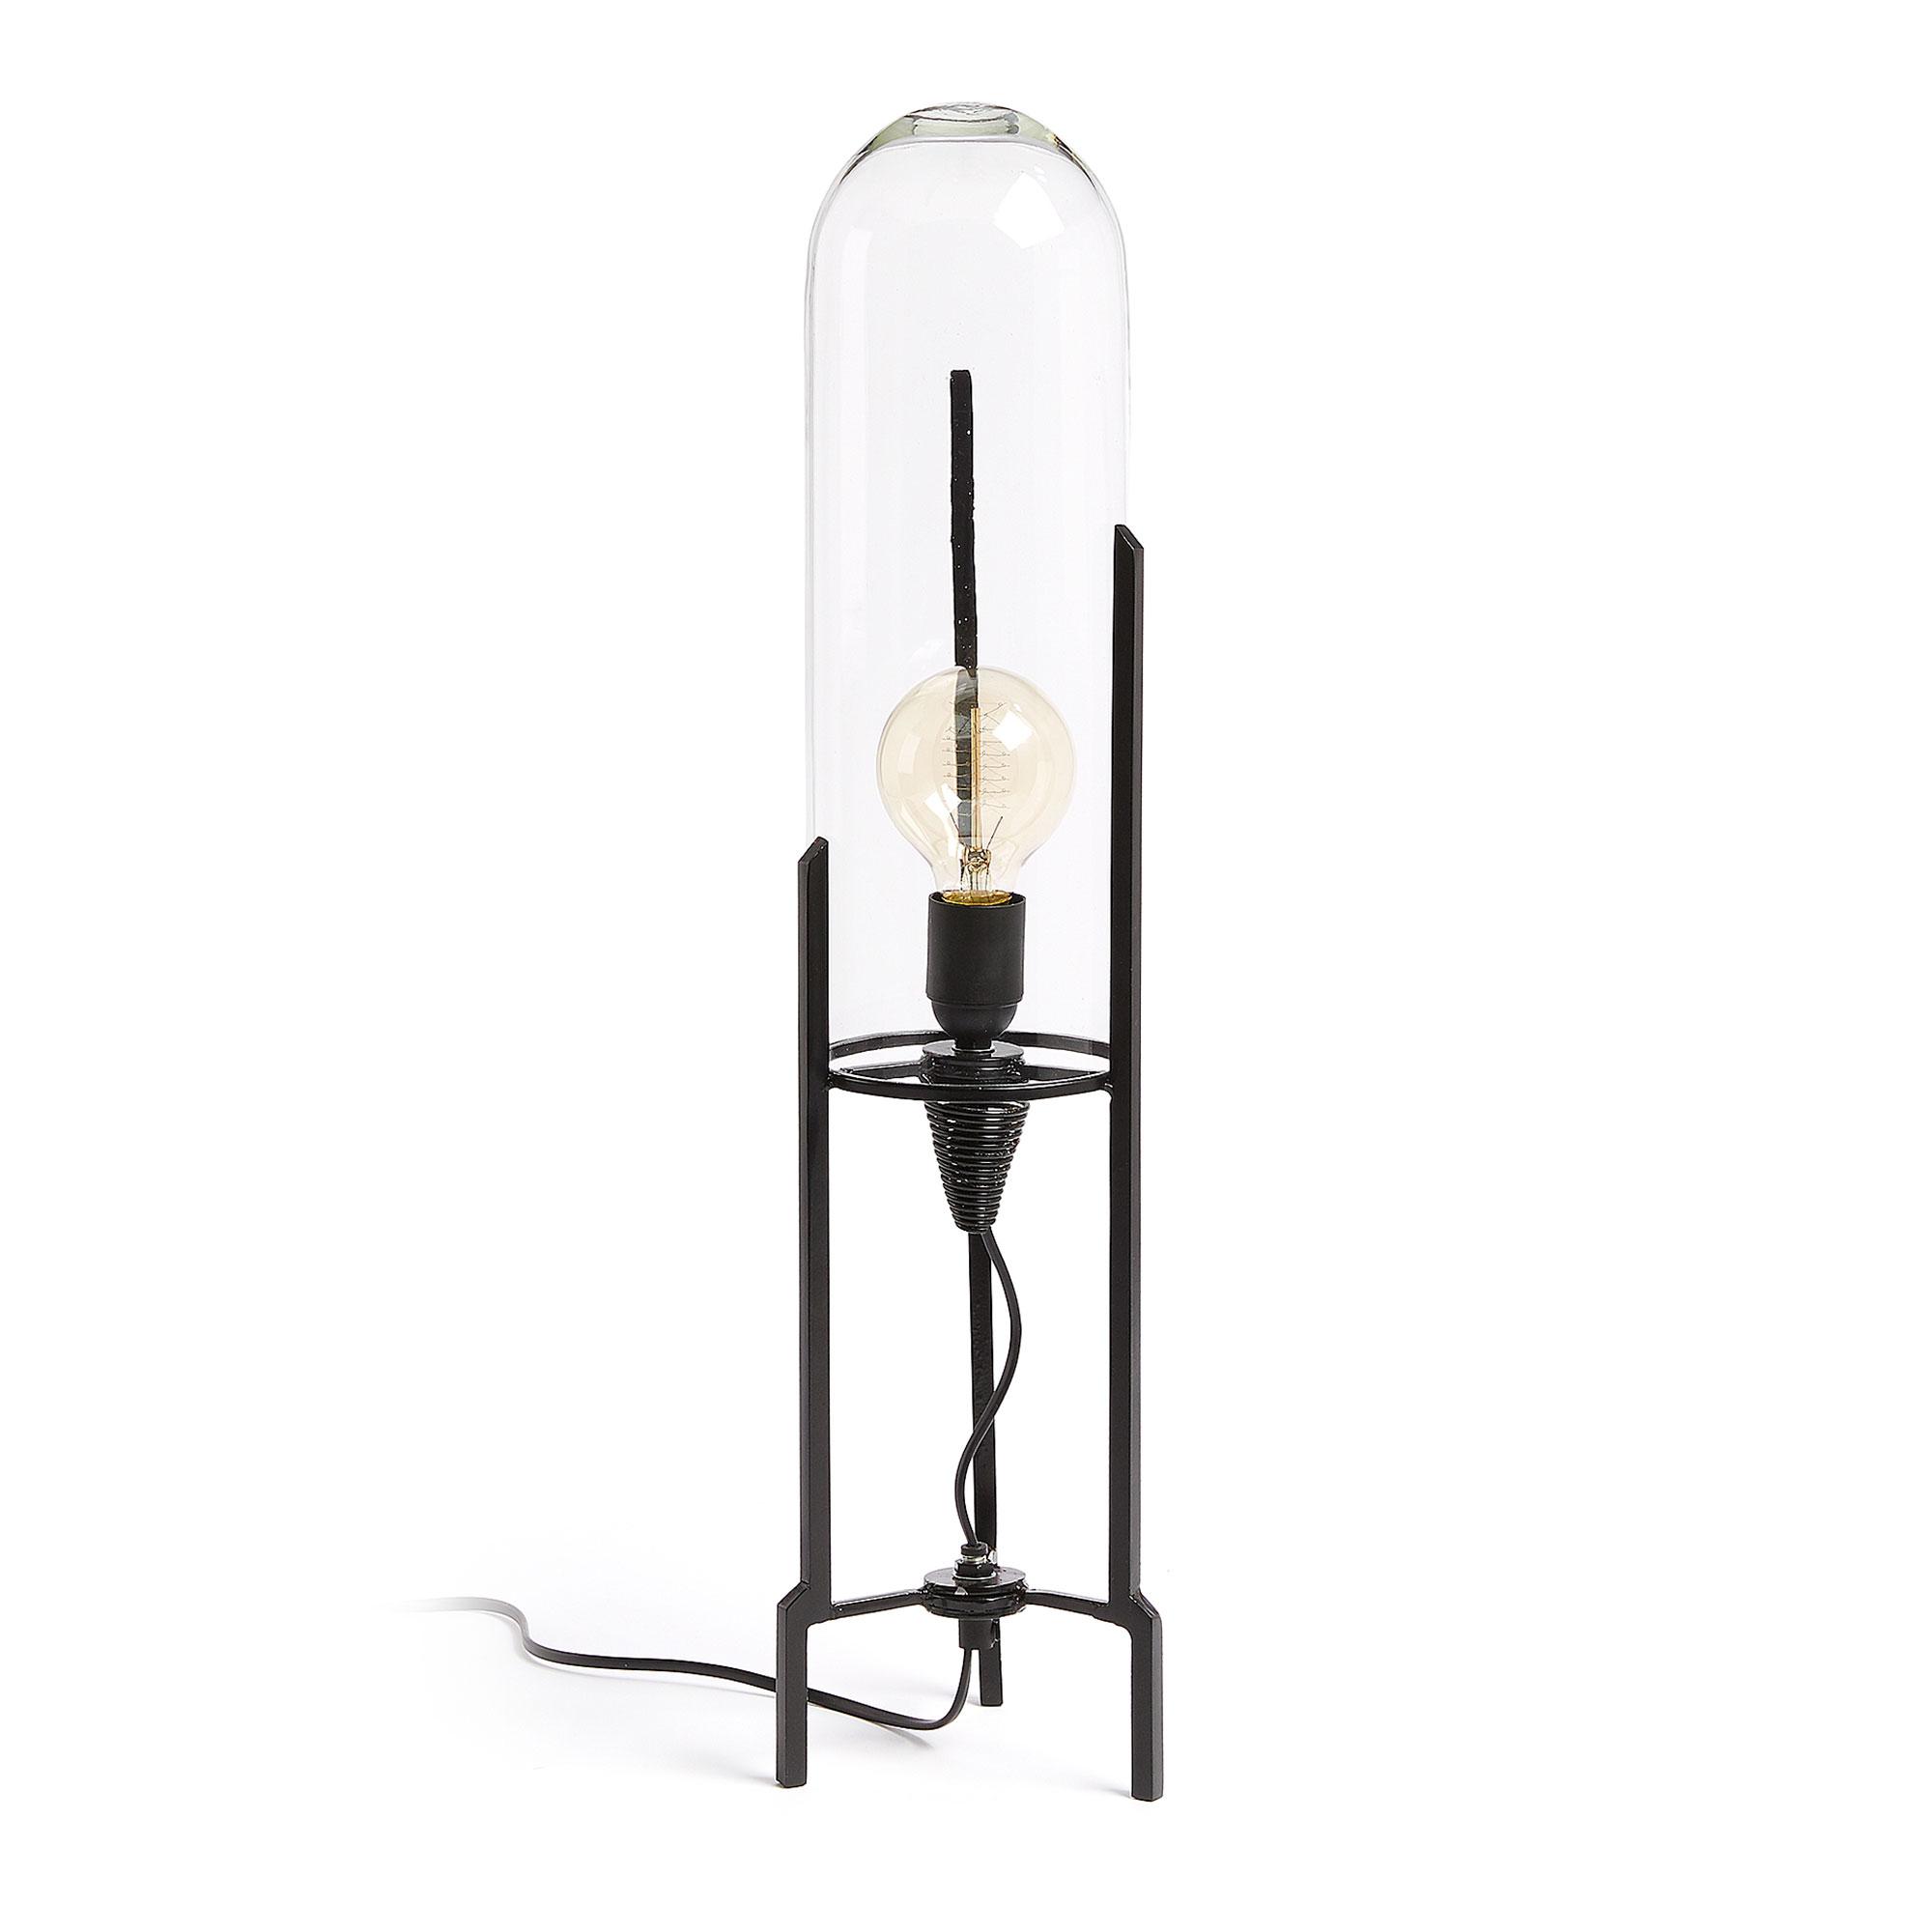 laforma Laforma chatanui bordlampe - sort/klar metal/glas fra boboonline.dk